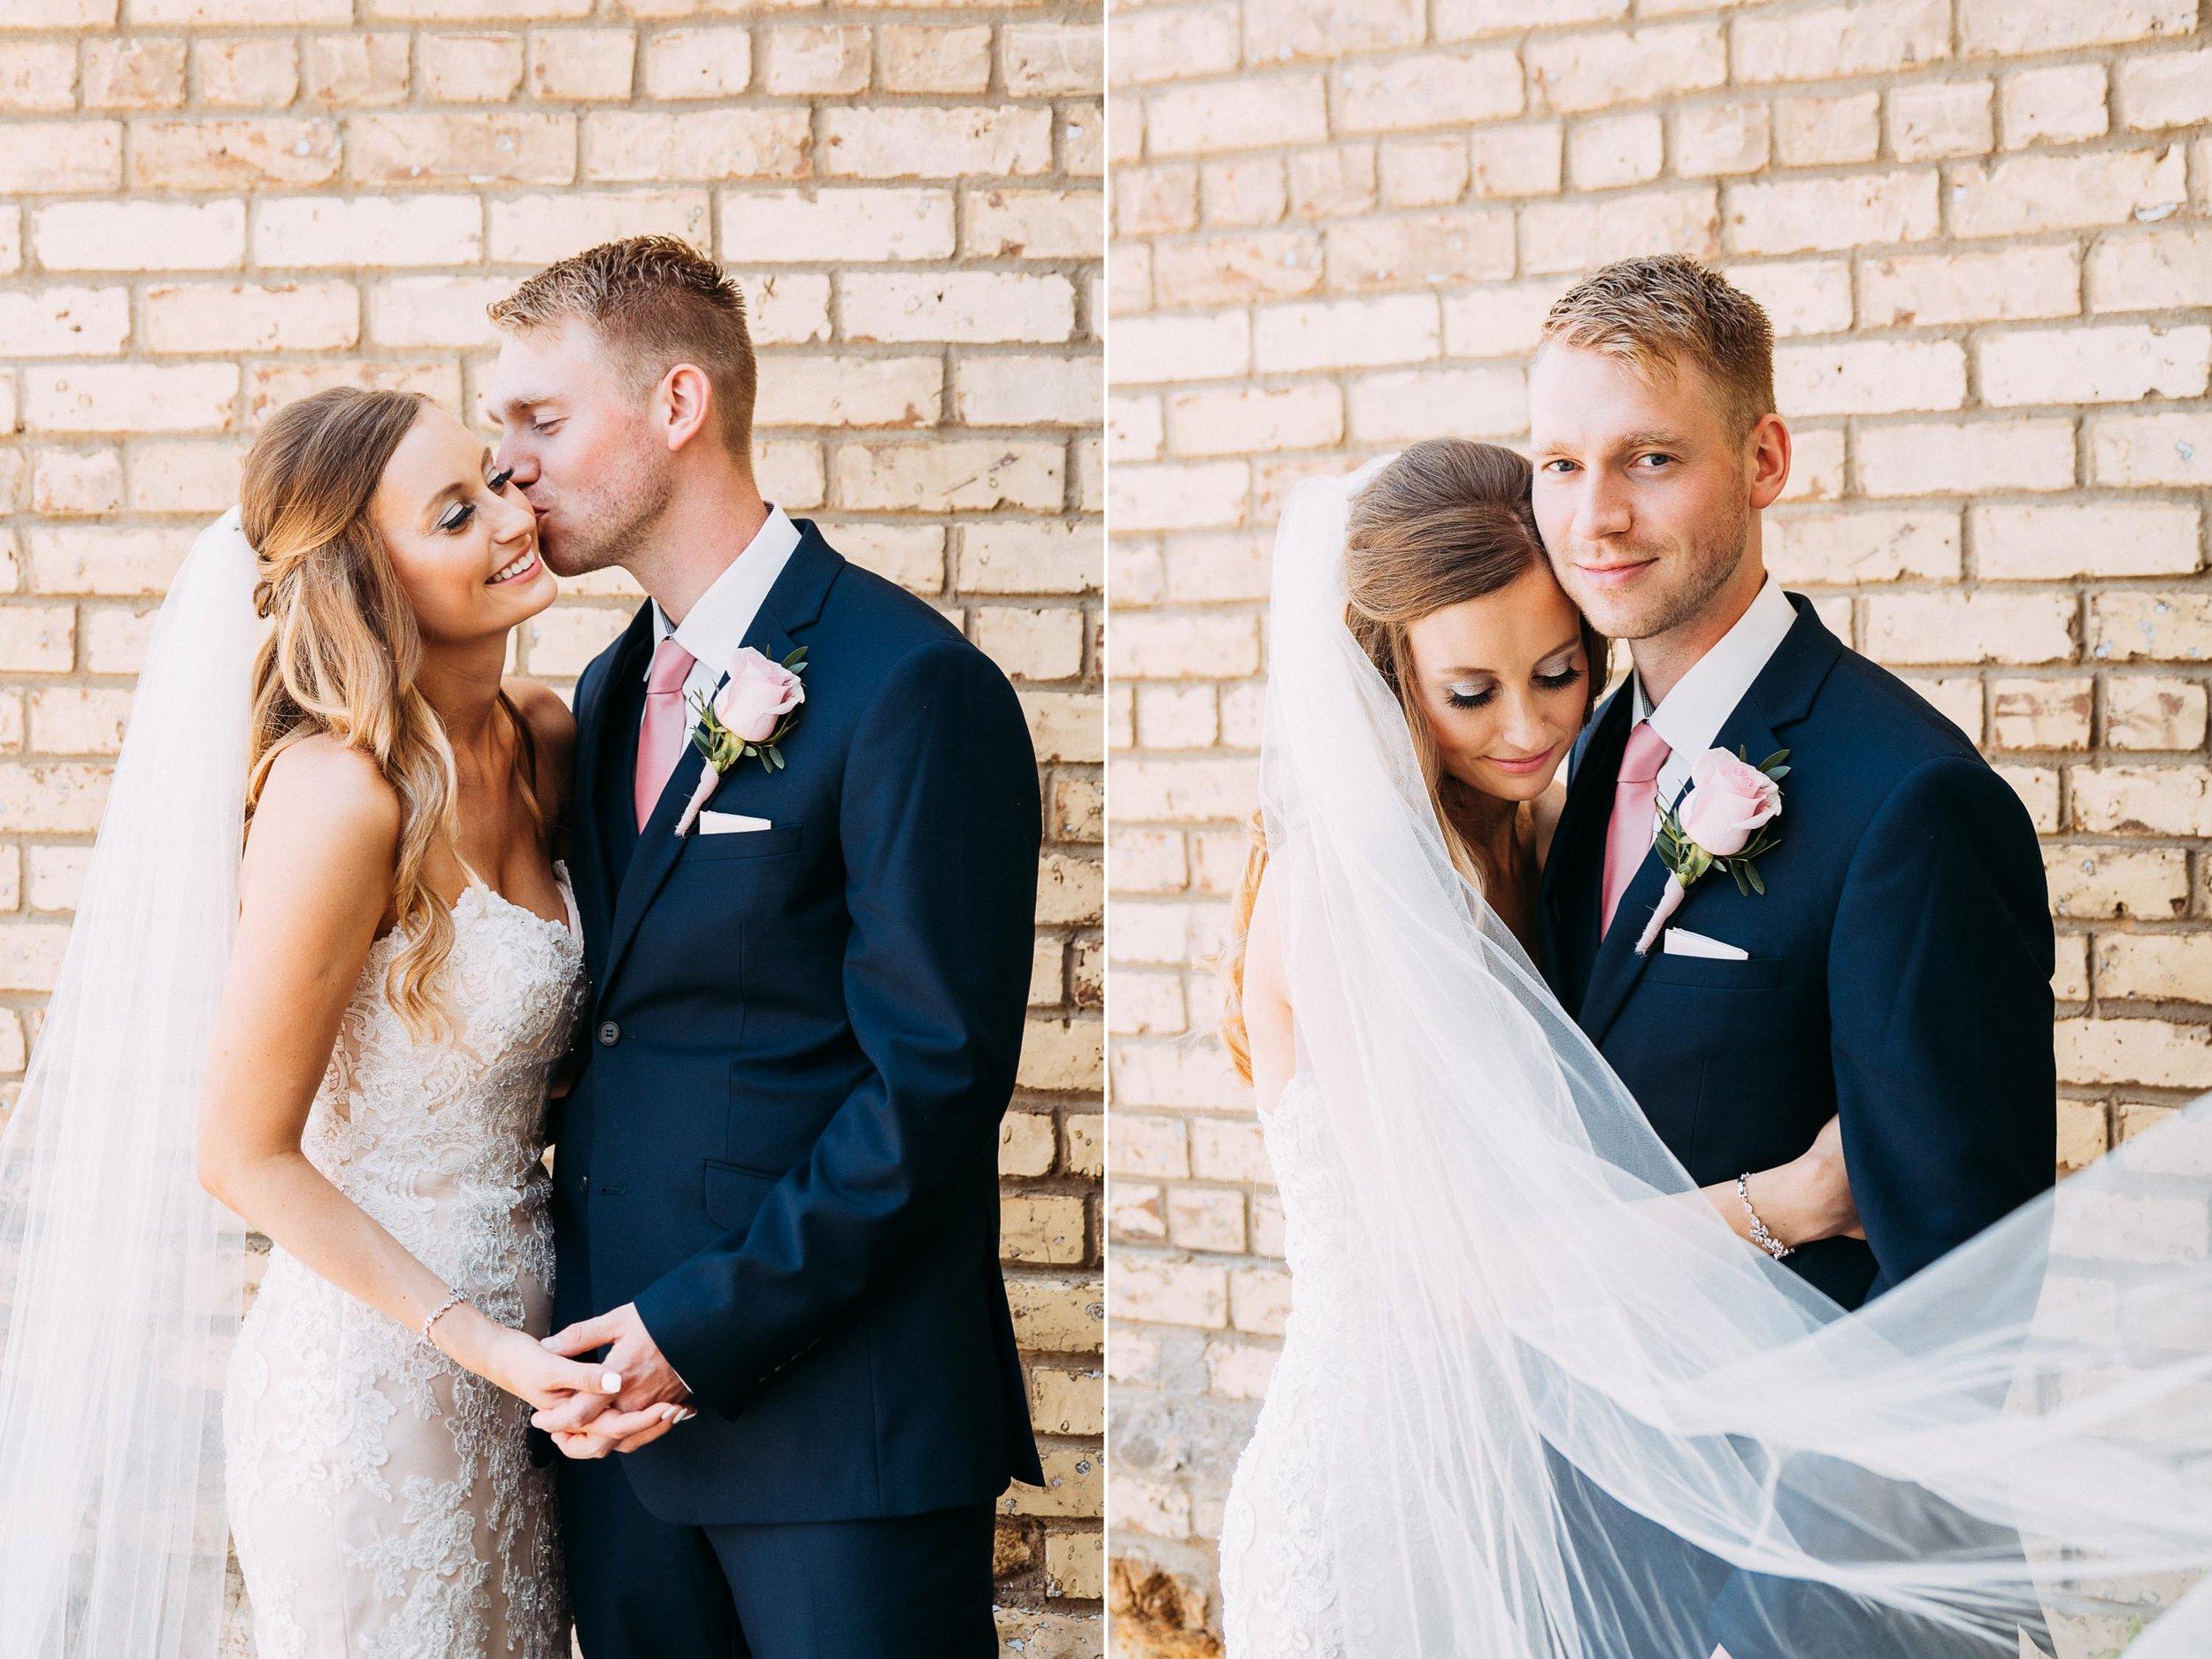 23-WeddingsattheBroz_Minnesota_WeddingBlog.jpg